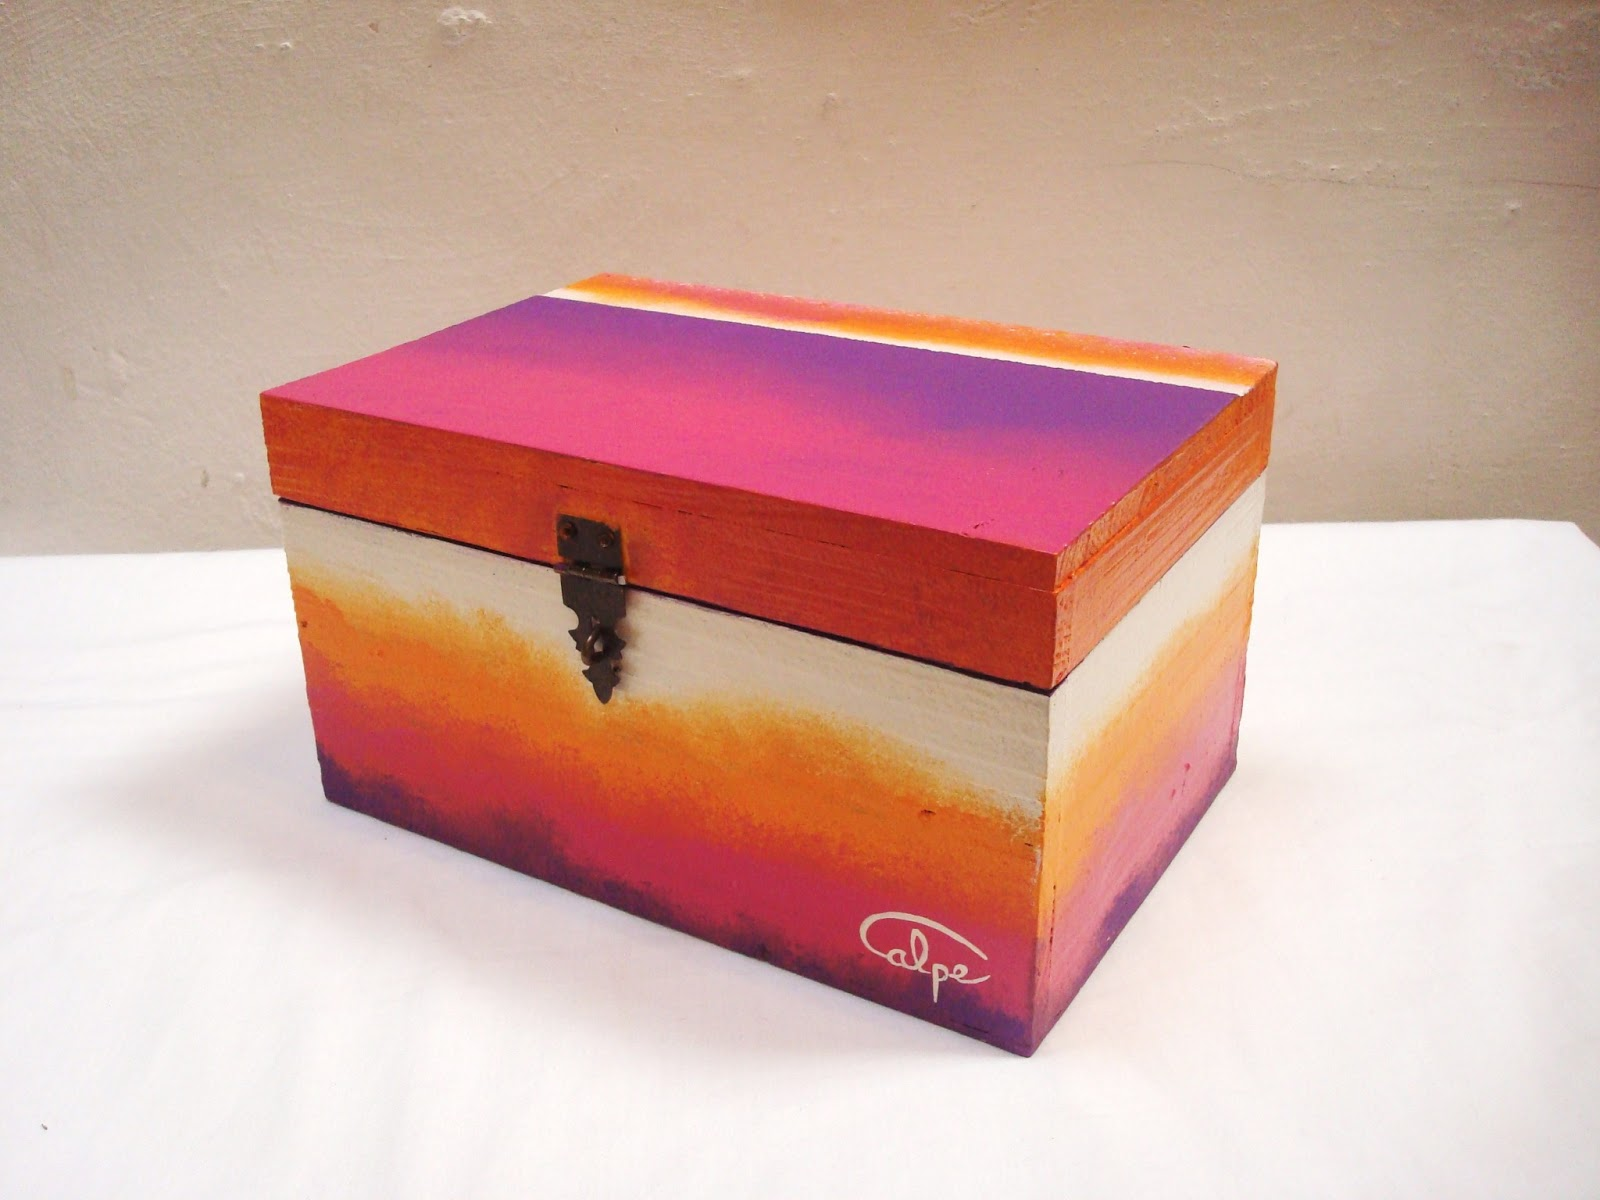 Calpearts cajas pintadas a mano - Dibujos para decorar cajas de madera ...